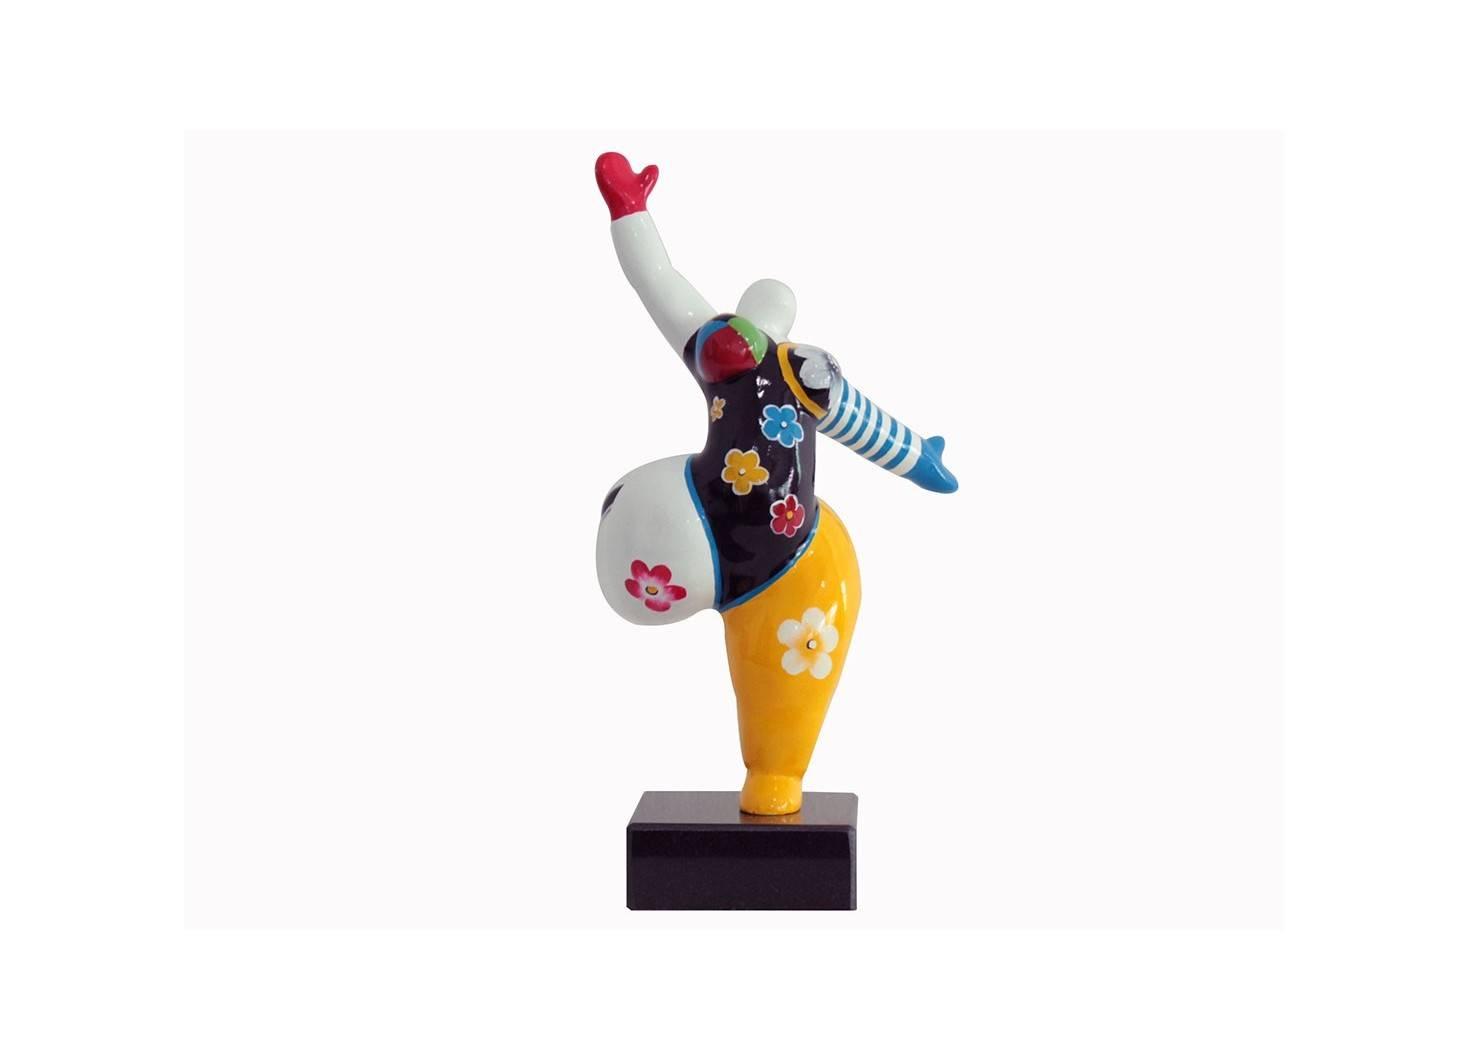 Statue Femme ronde, danseuse. Motifs fleuris